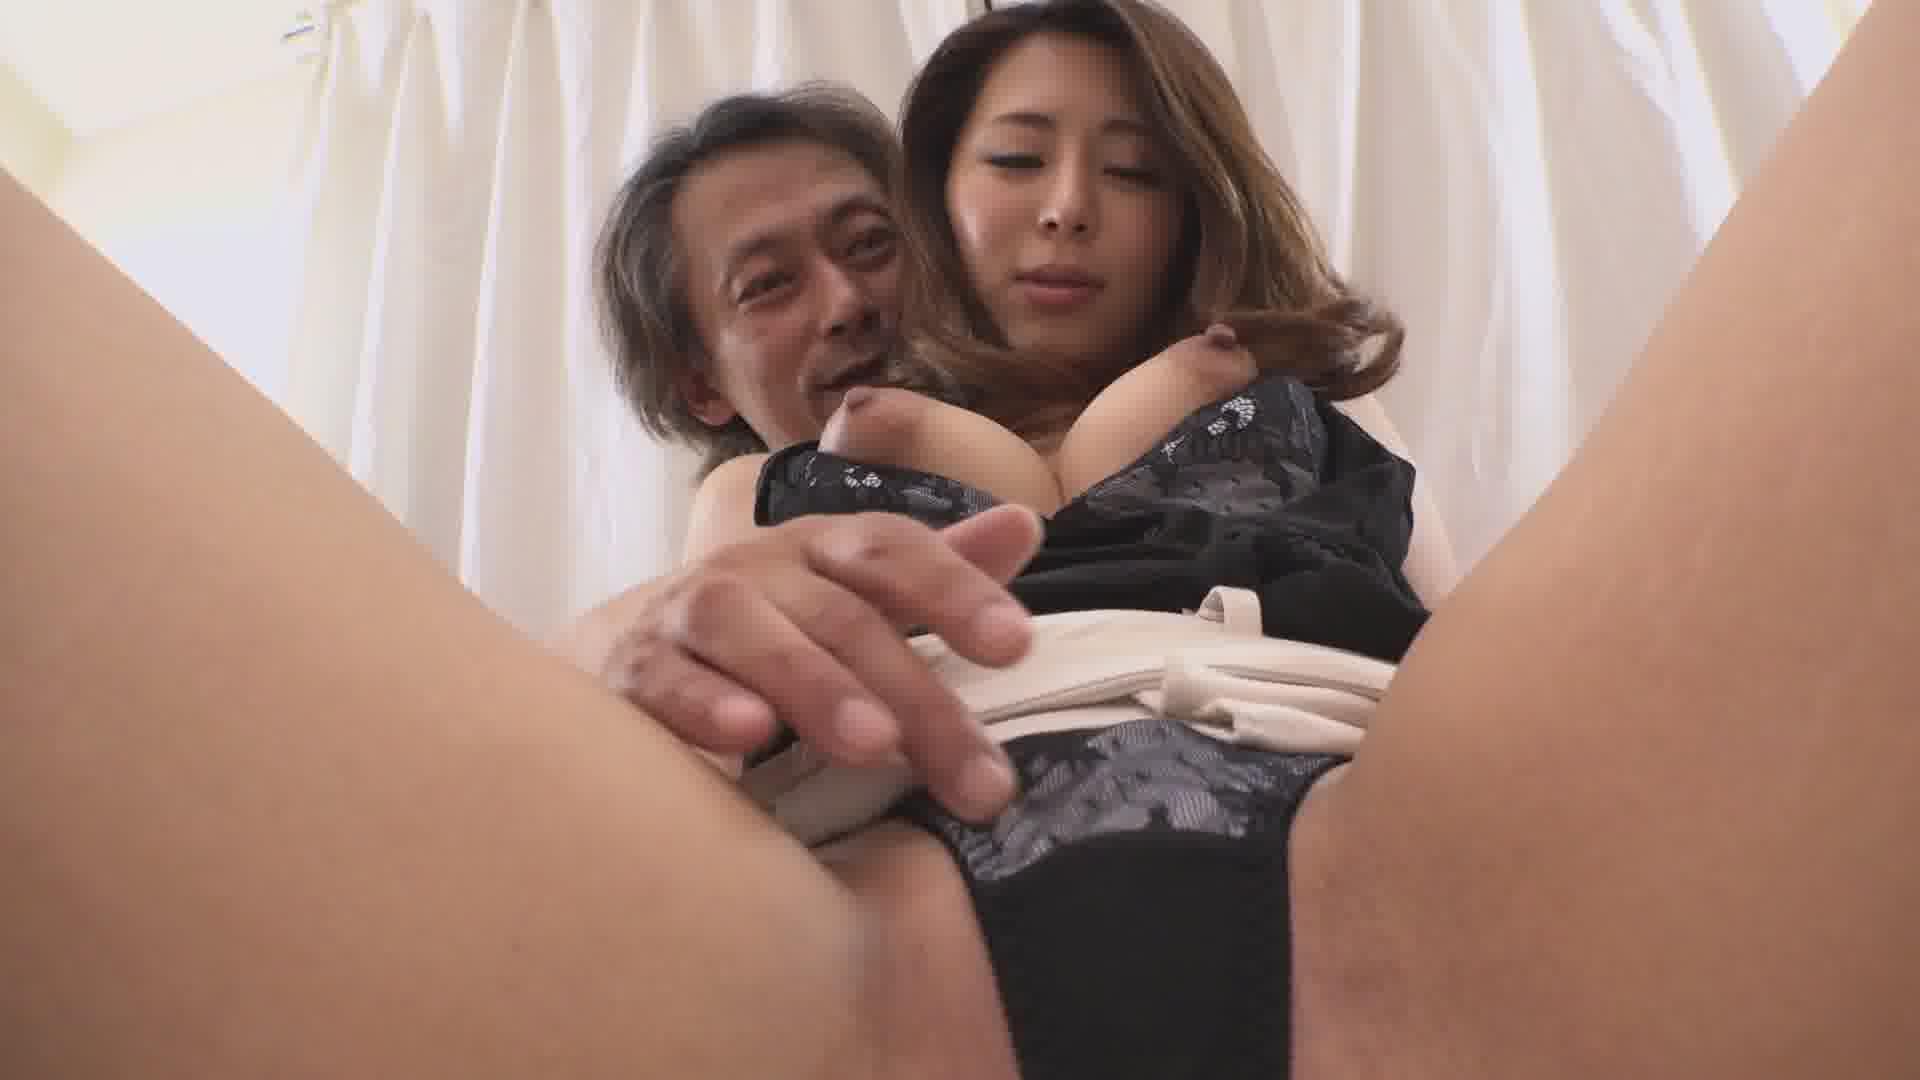 AV業界で見た! ~おかわりセックスをするほどSEXが大好きなみかんちゃん~ - 枢木みかん【痴女・巨乳・中出し】